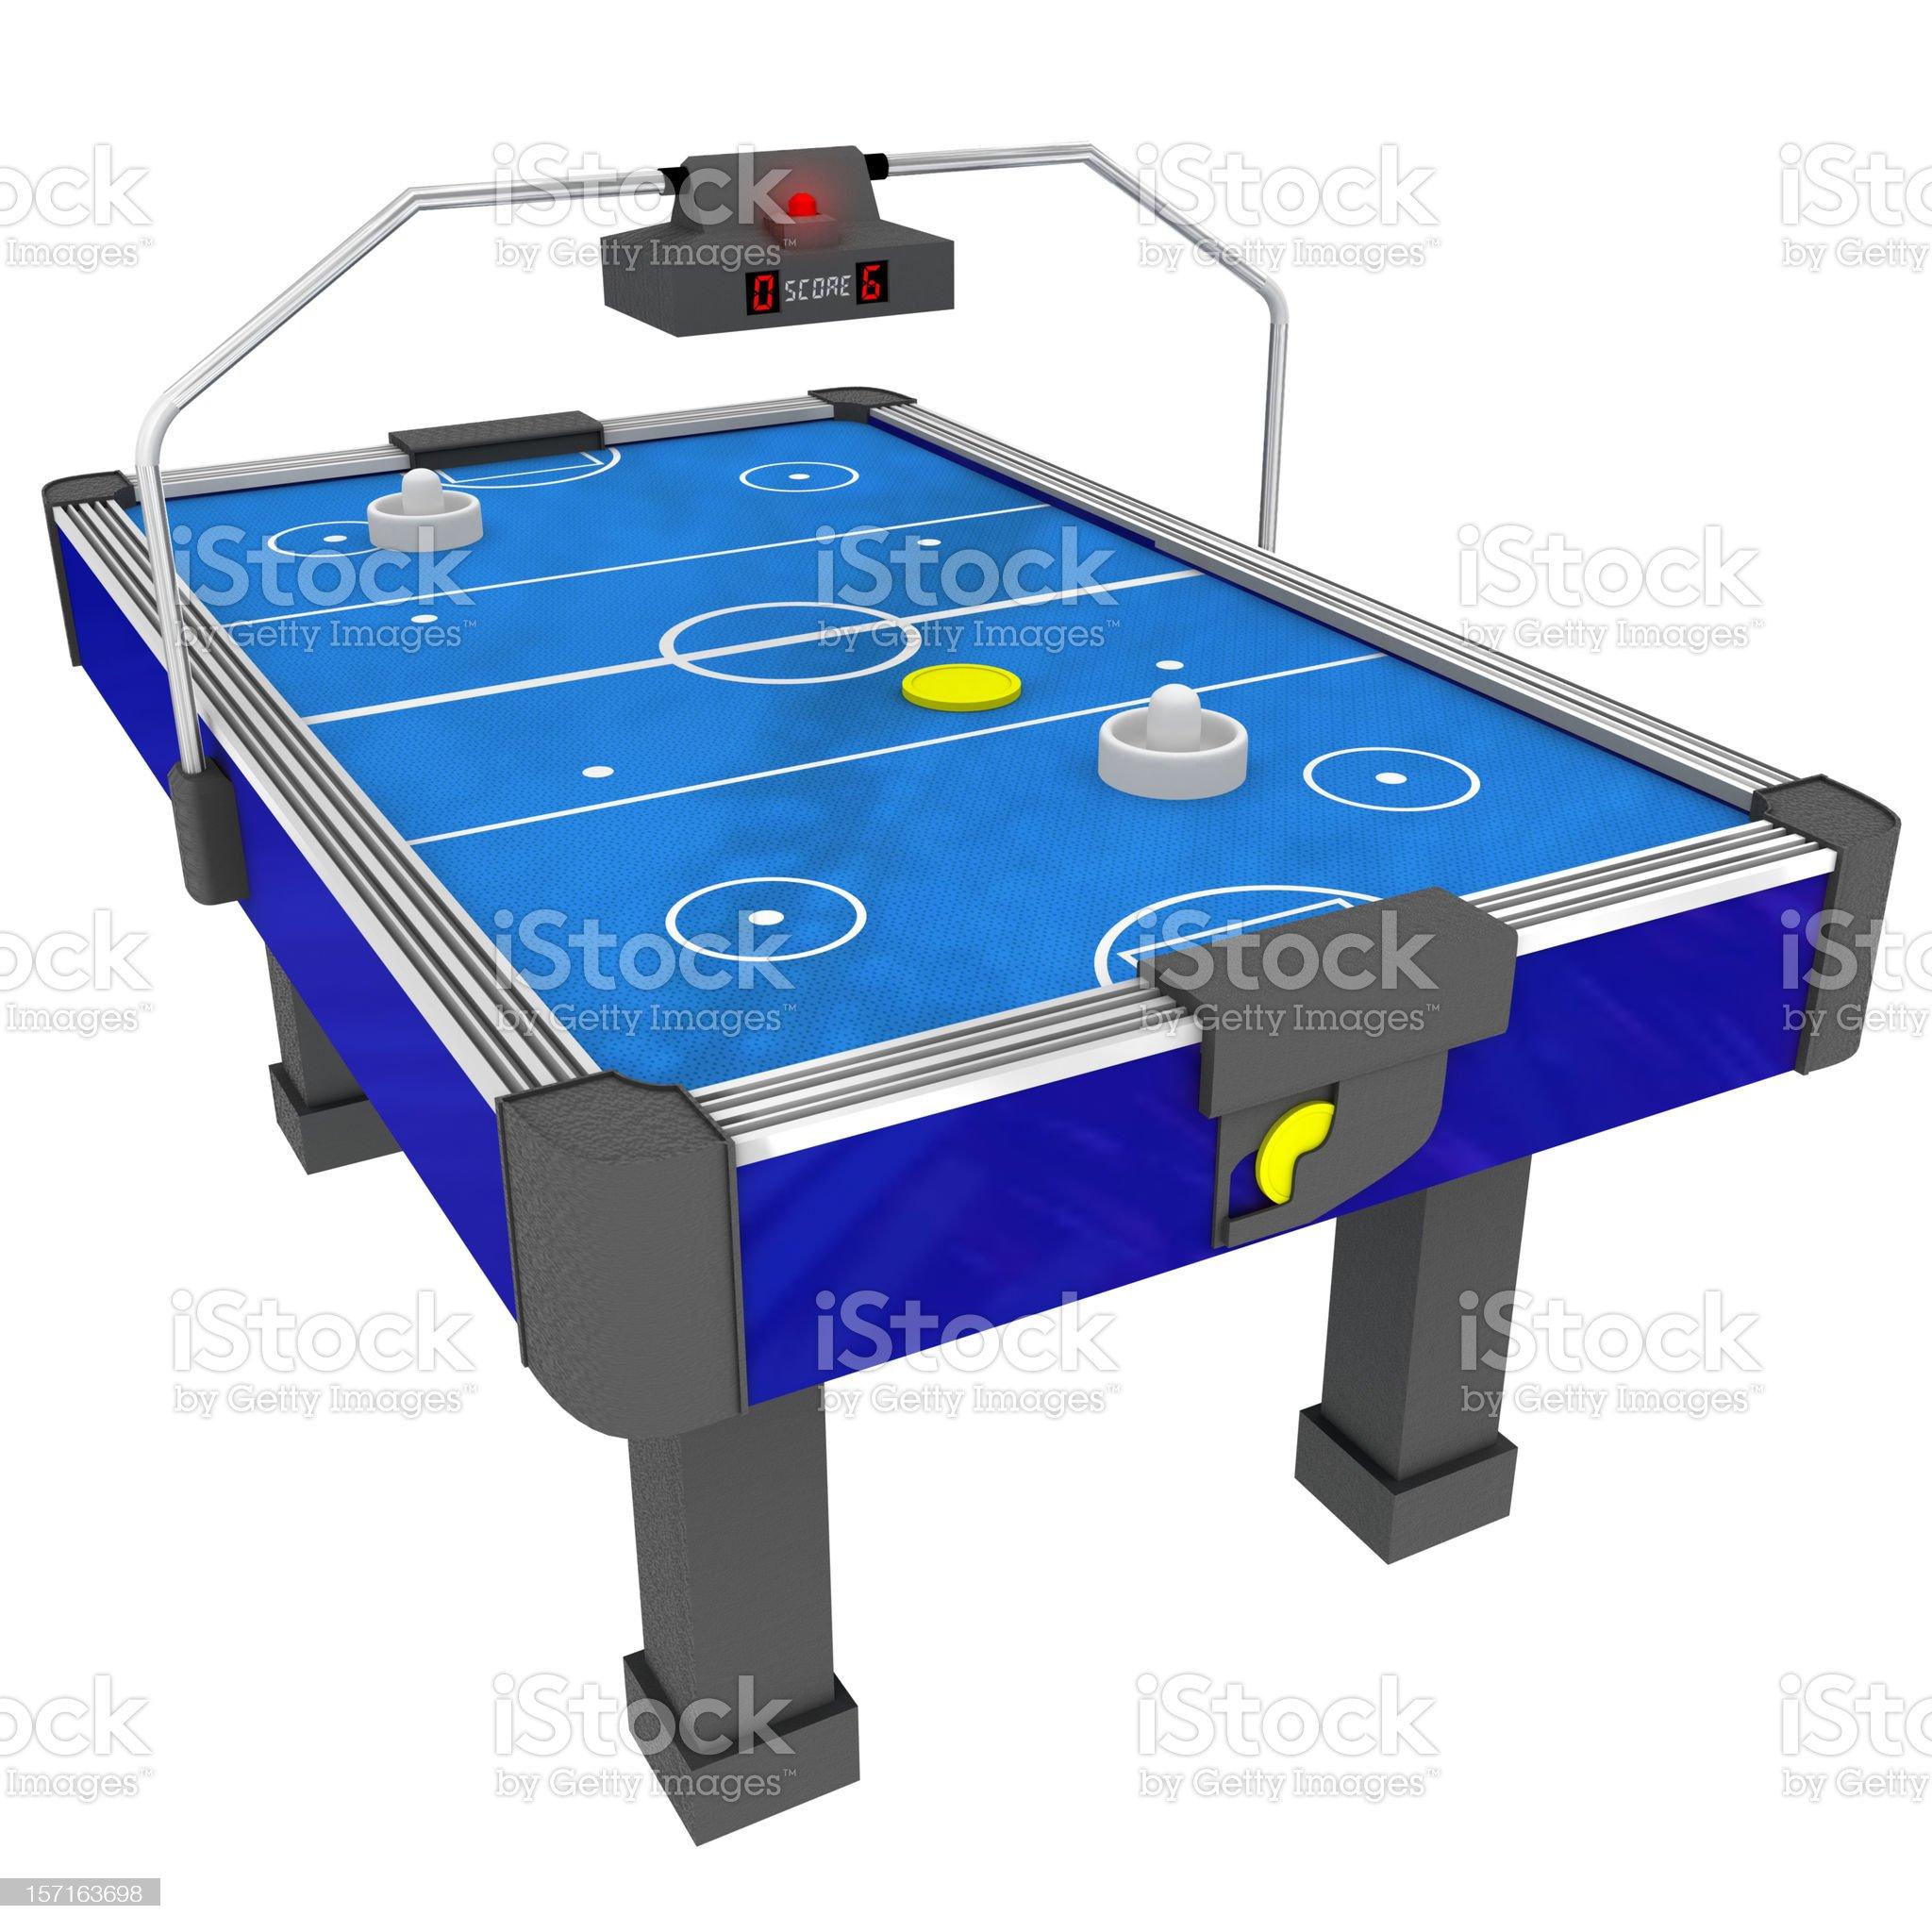 Air Hockey Table 3D (Isolated) royalty-free stock photo